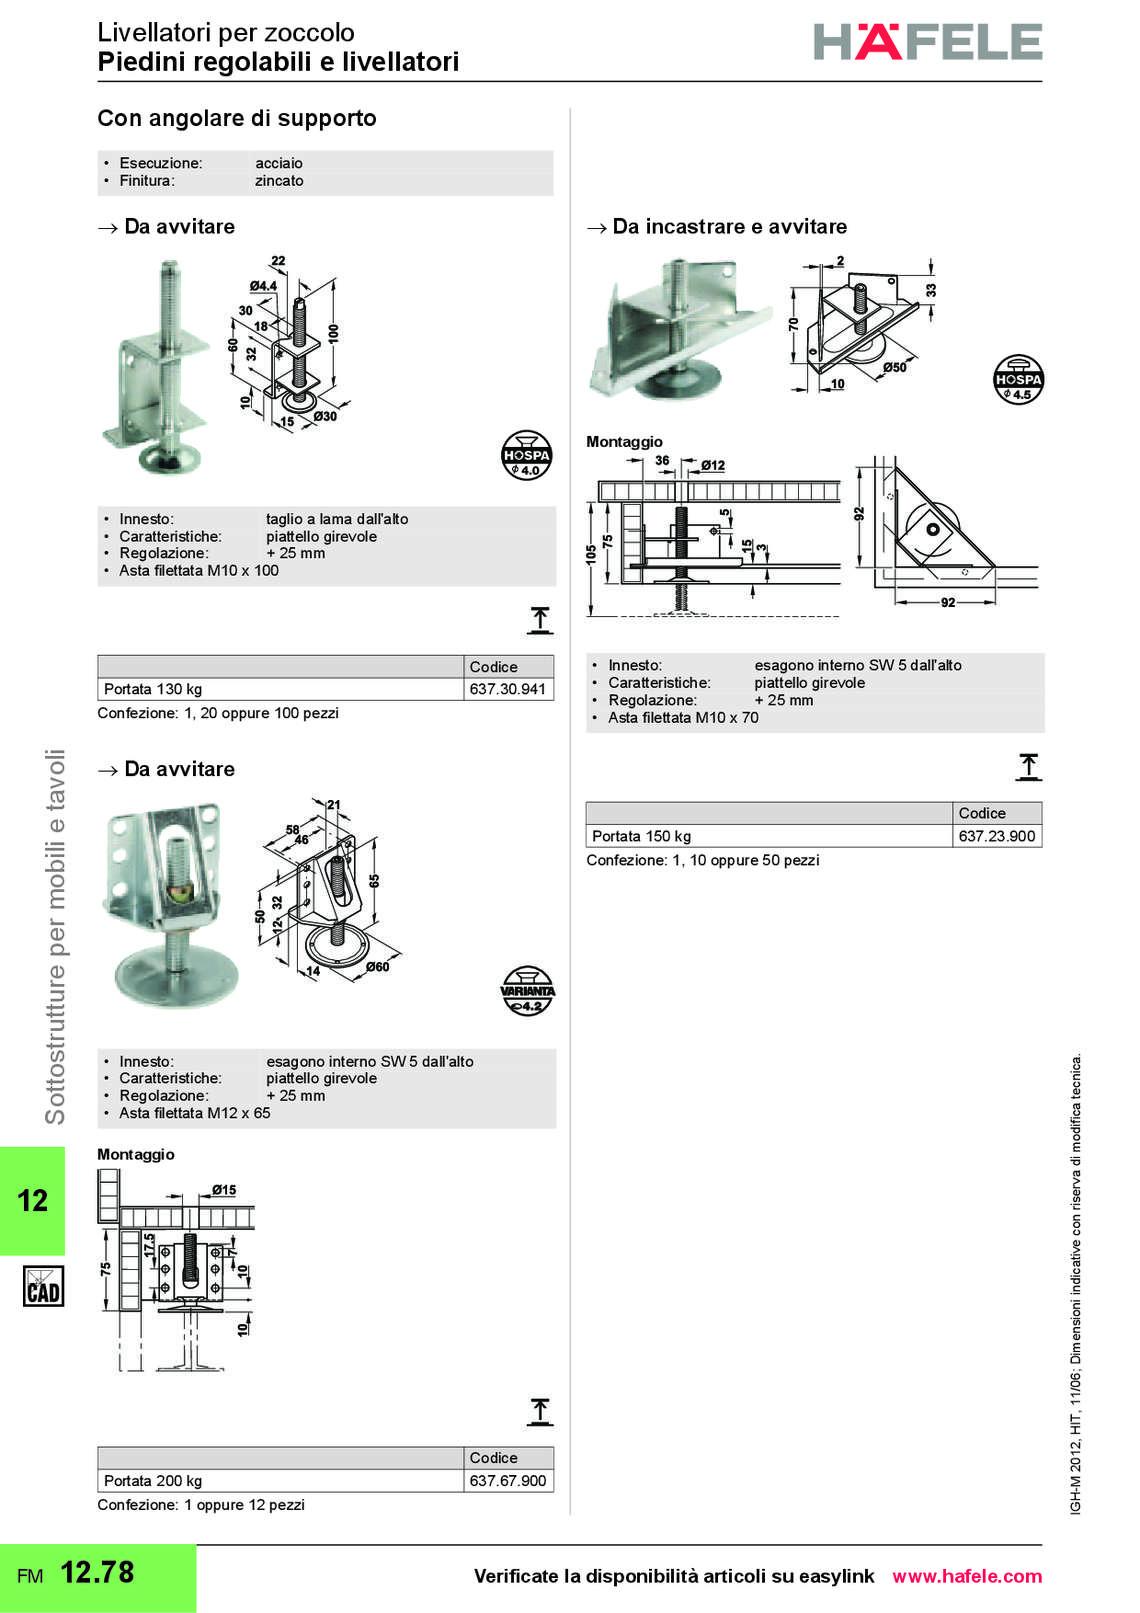 hafele-sottostrutture-per-mobili_83_101.jpg